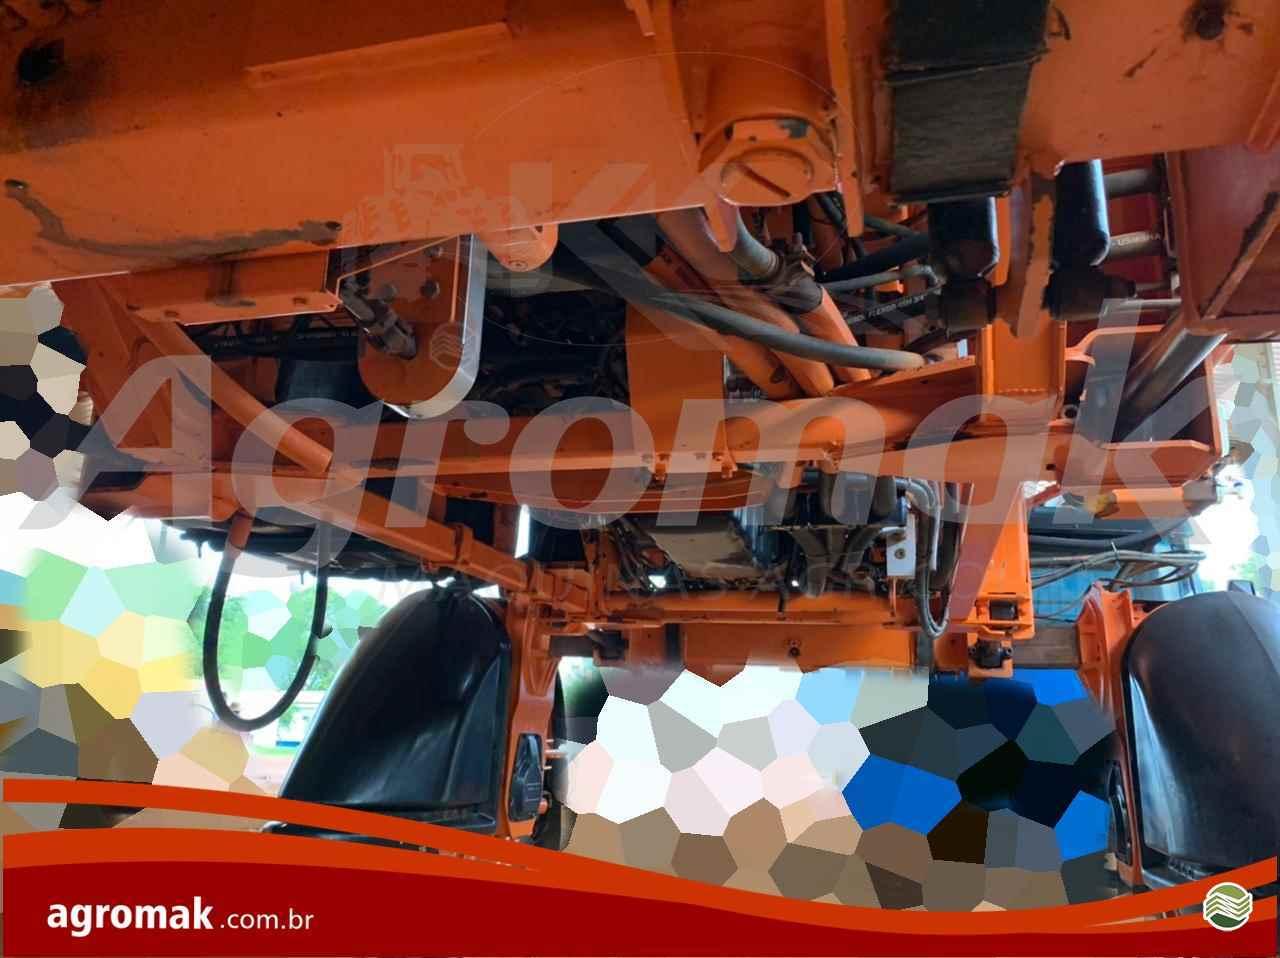 JACTO UNIPORT 3000 NPK  2005/2005 Agromak Máquinas Agrícolas